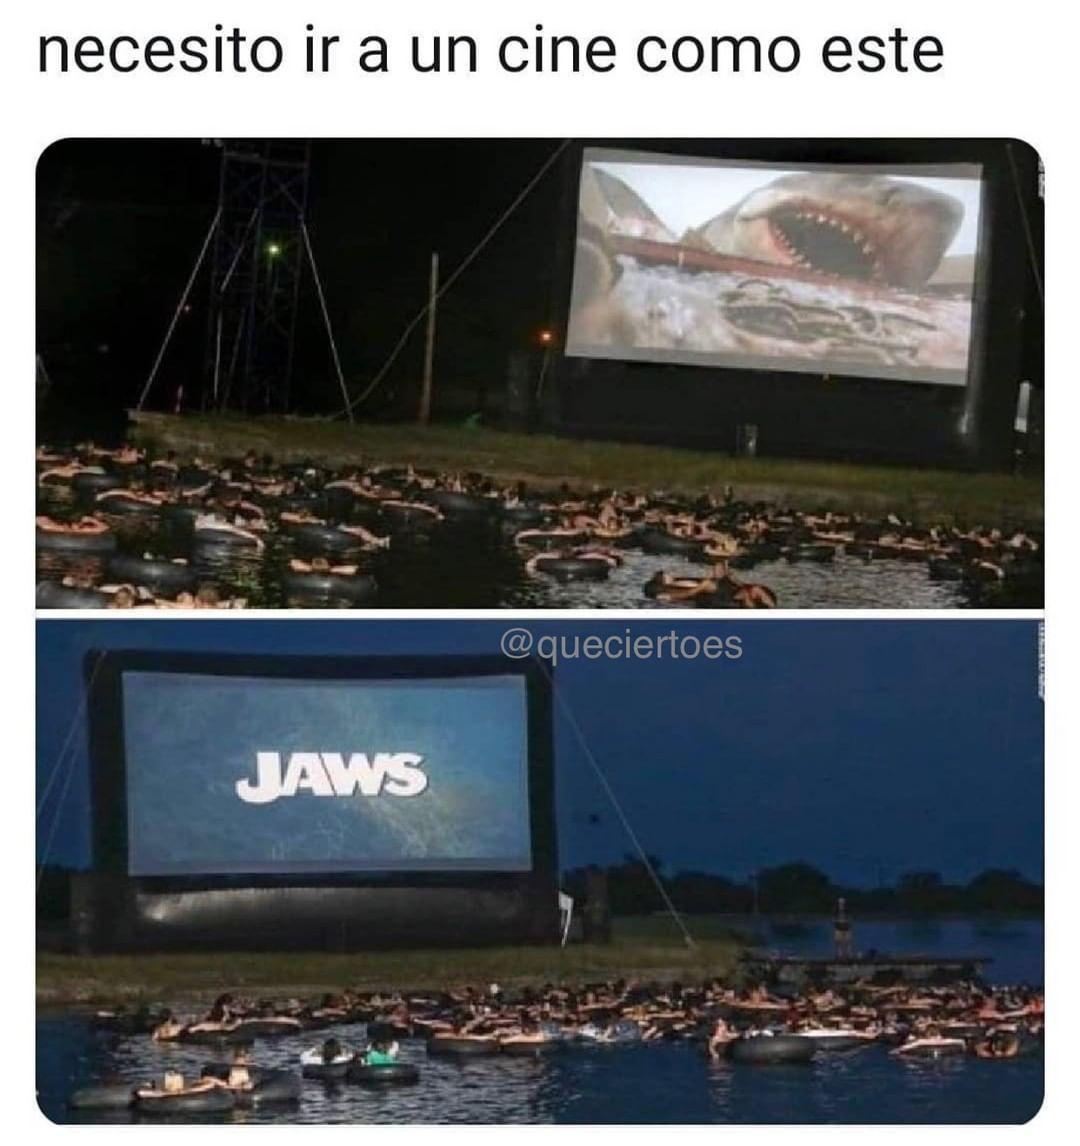 Necesito ir a un cine como este.